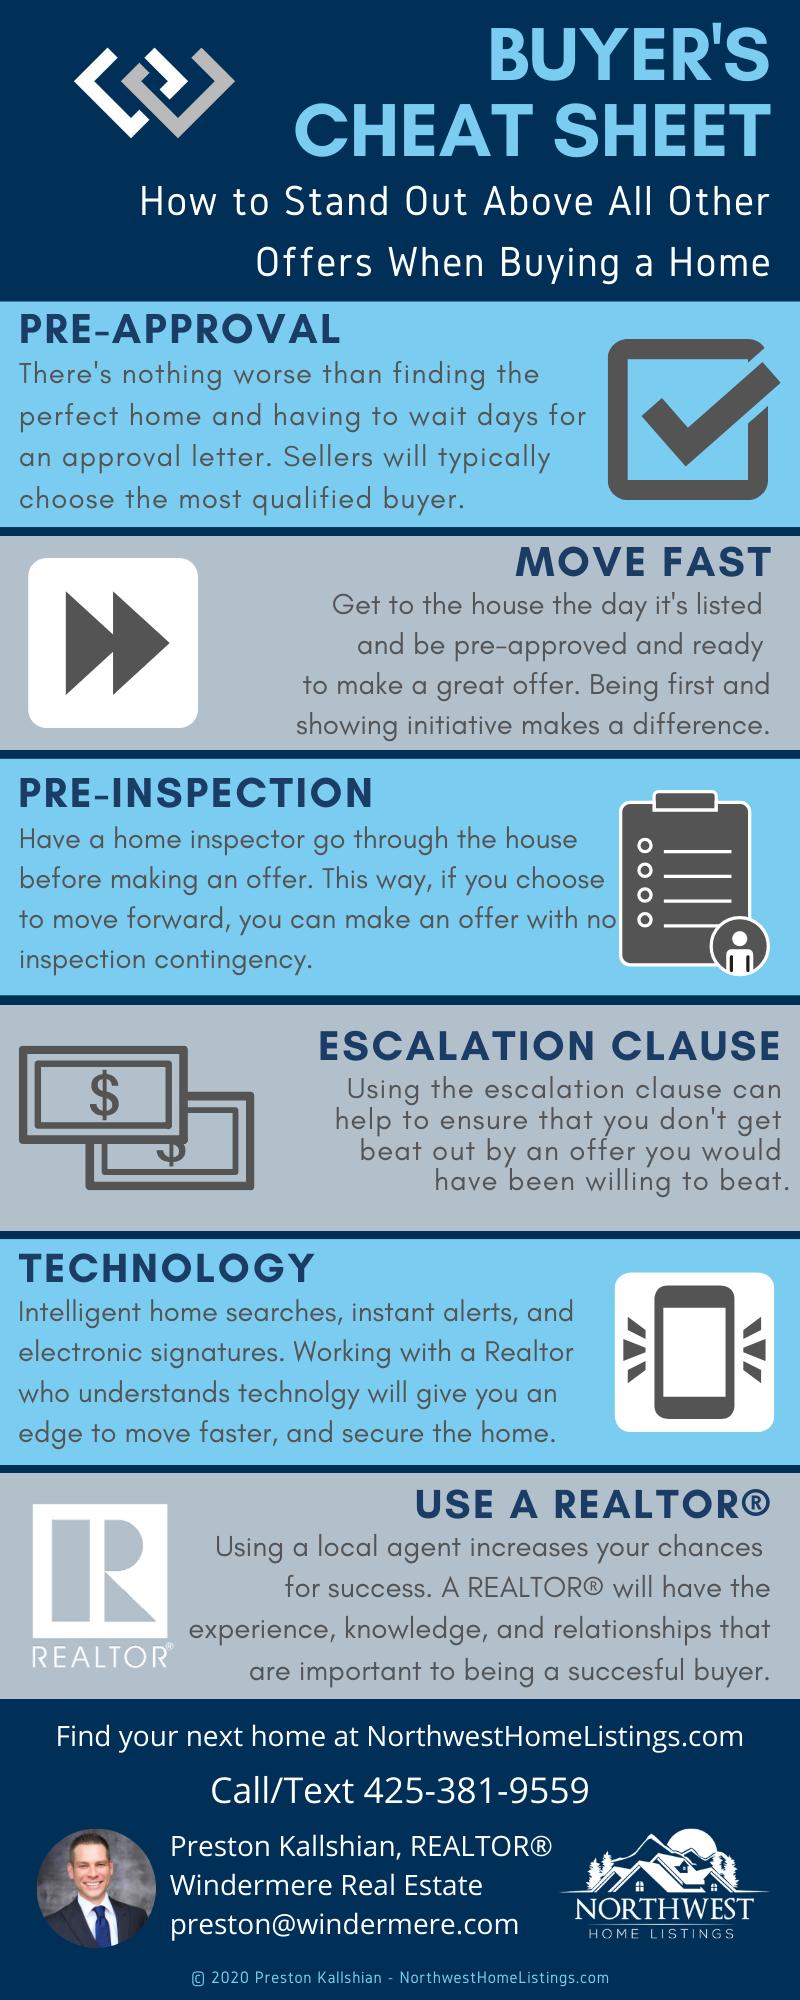 Home Buyer's Cheat Sheet 2020